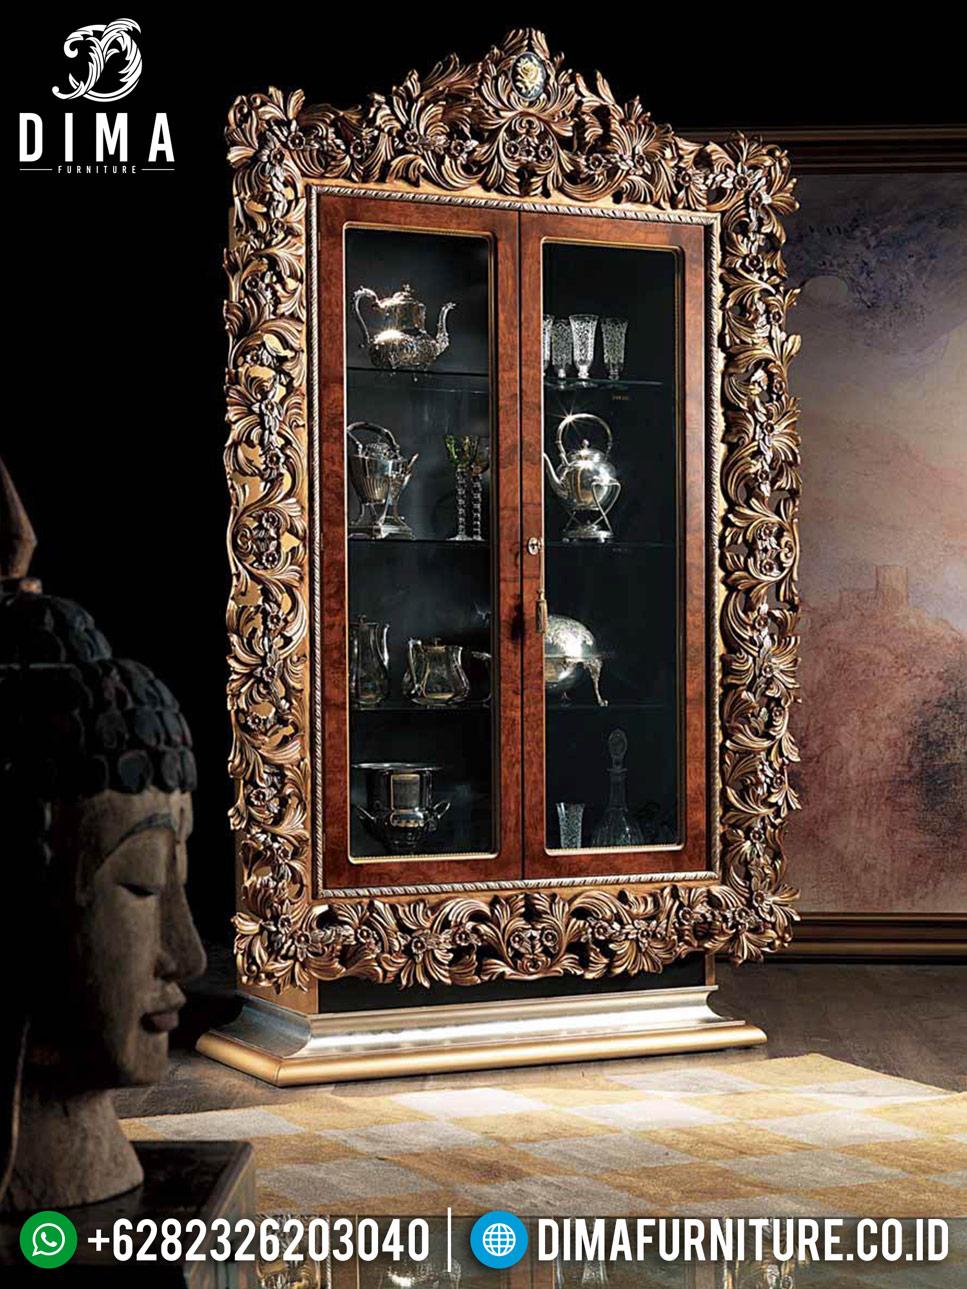 Great Art Lemari Hias Mewah Luxury Classic Golden Relief Furniture Jepara Interior MMJ-0754